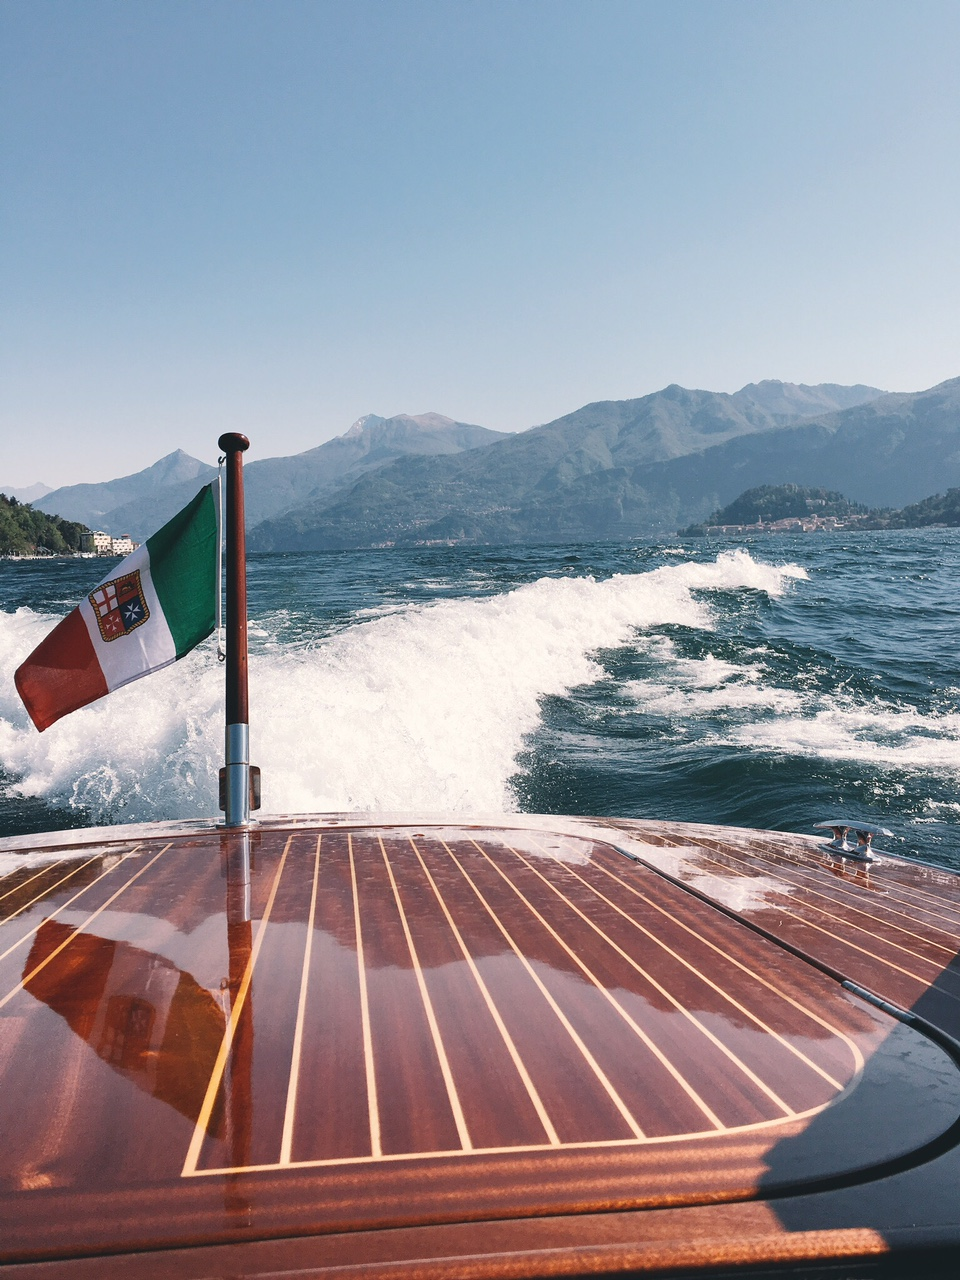 Boat water limousine traveling across Lake Como Italian flag